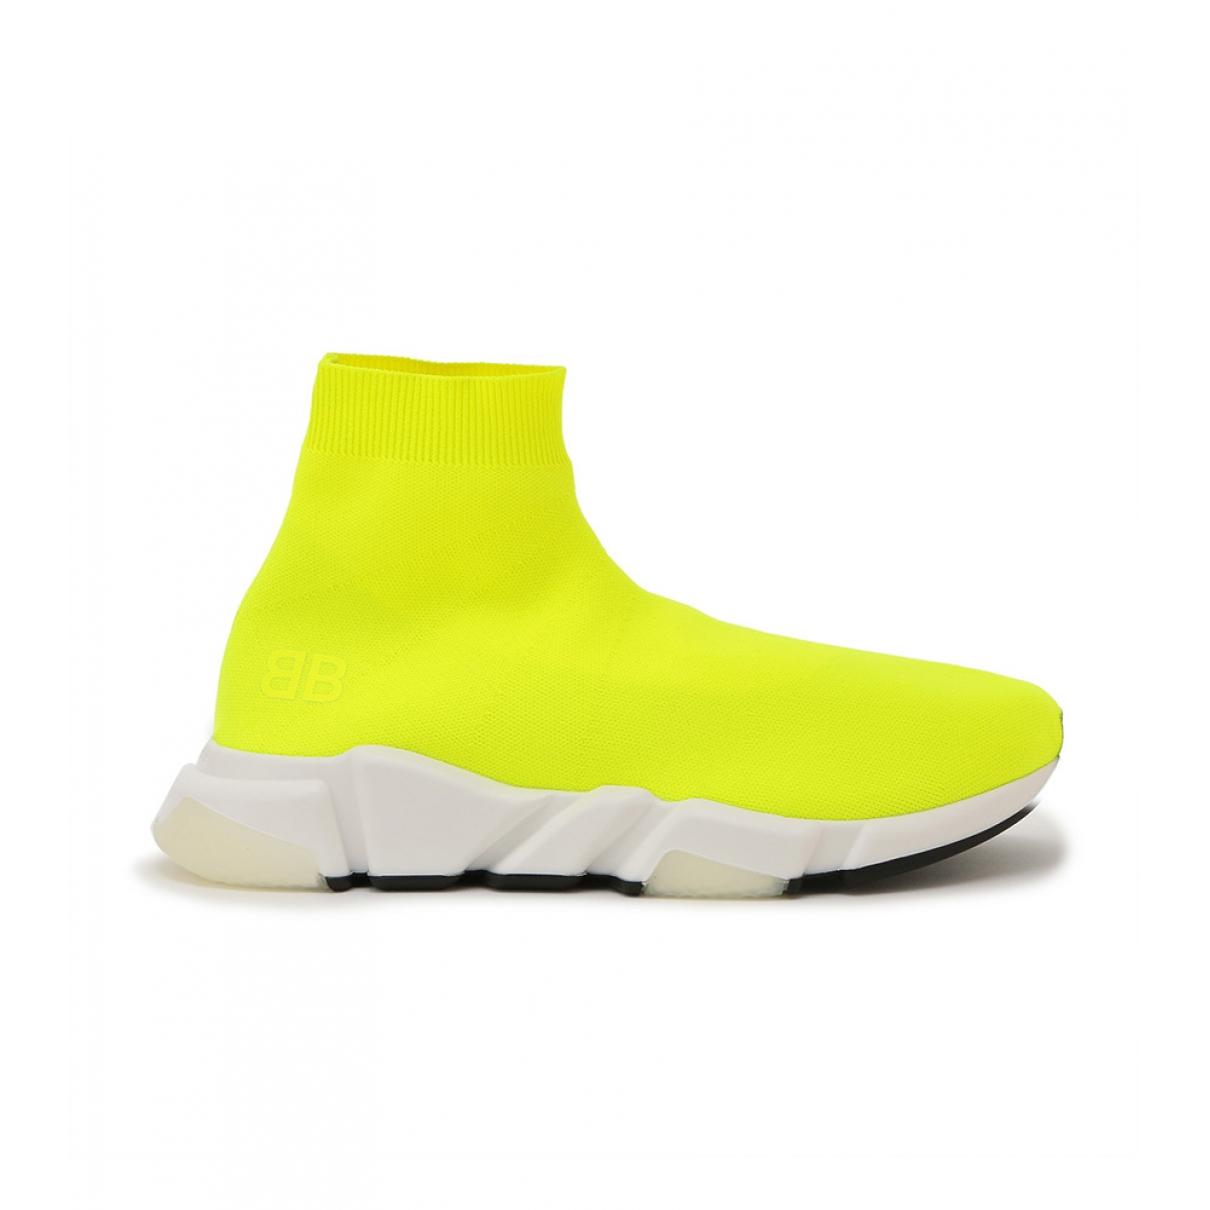 Balenciaga Speed Yellow Cloth Trainers for Men 42 EU